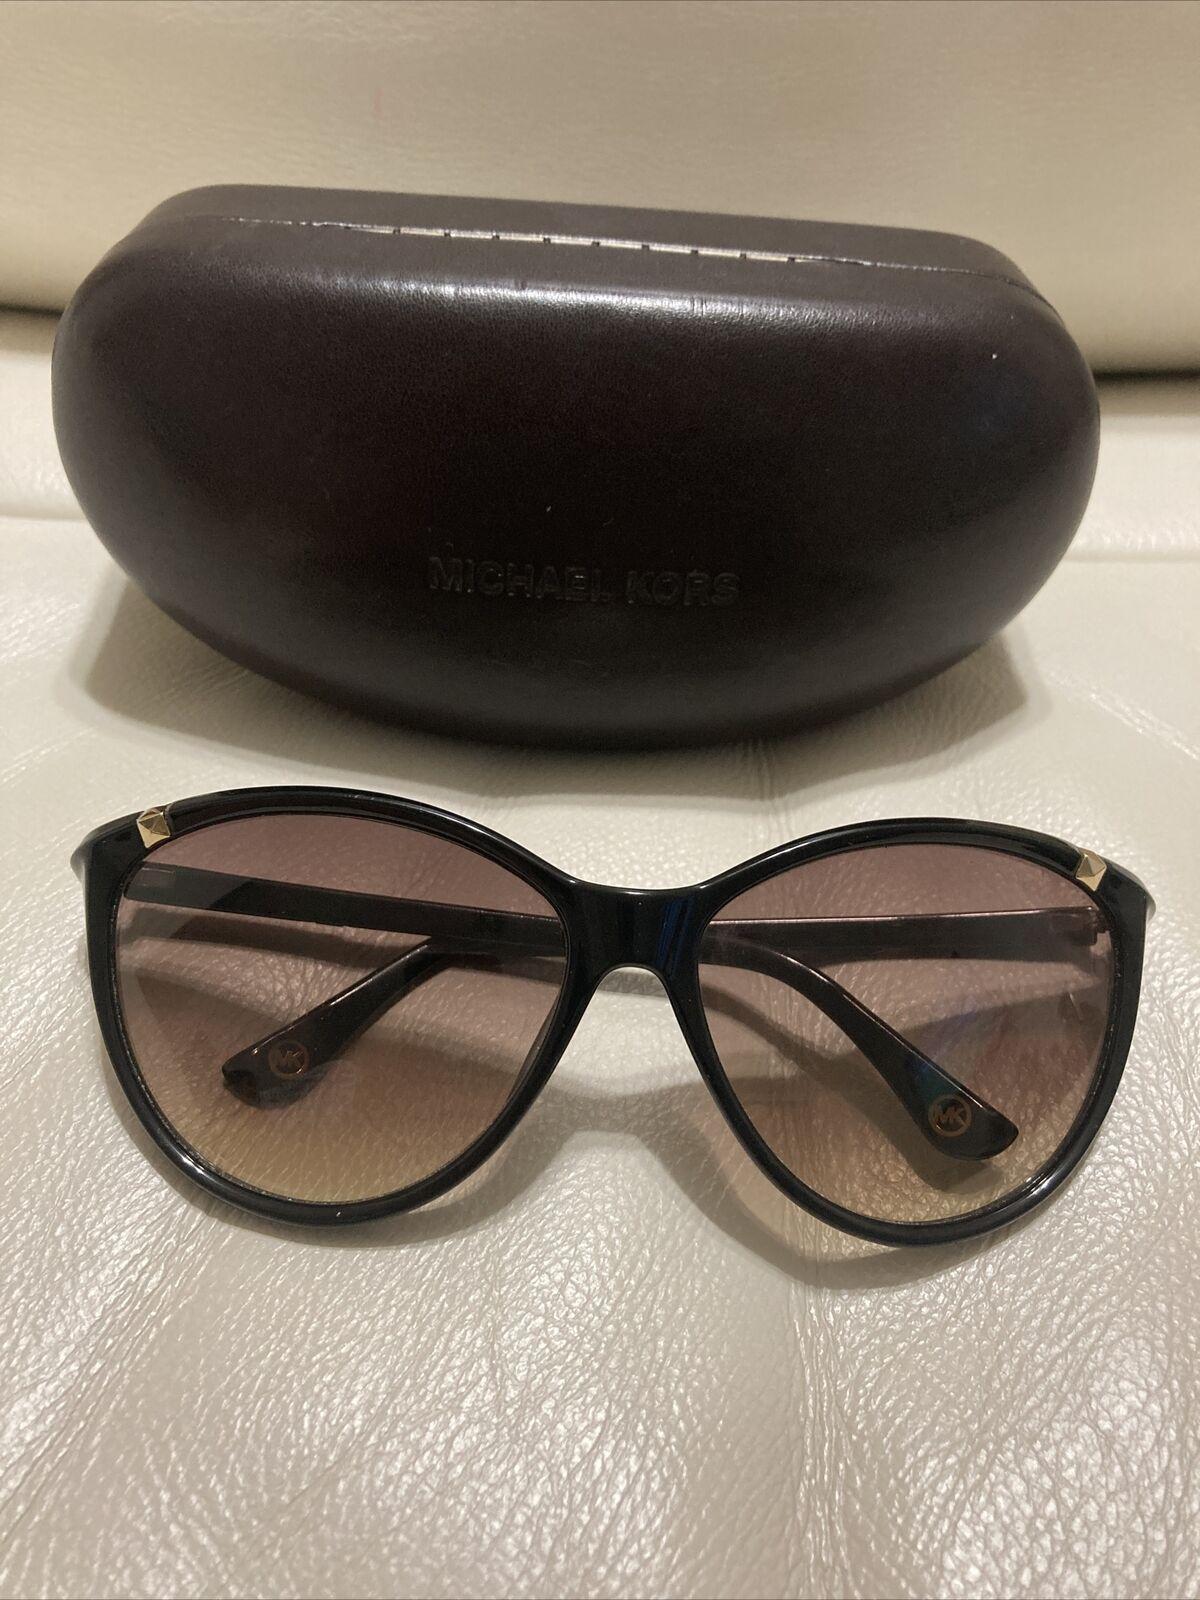 MICHALE KORS !!! Women's Sunglasses Black Cat Eye